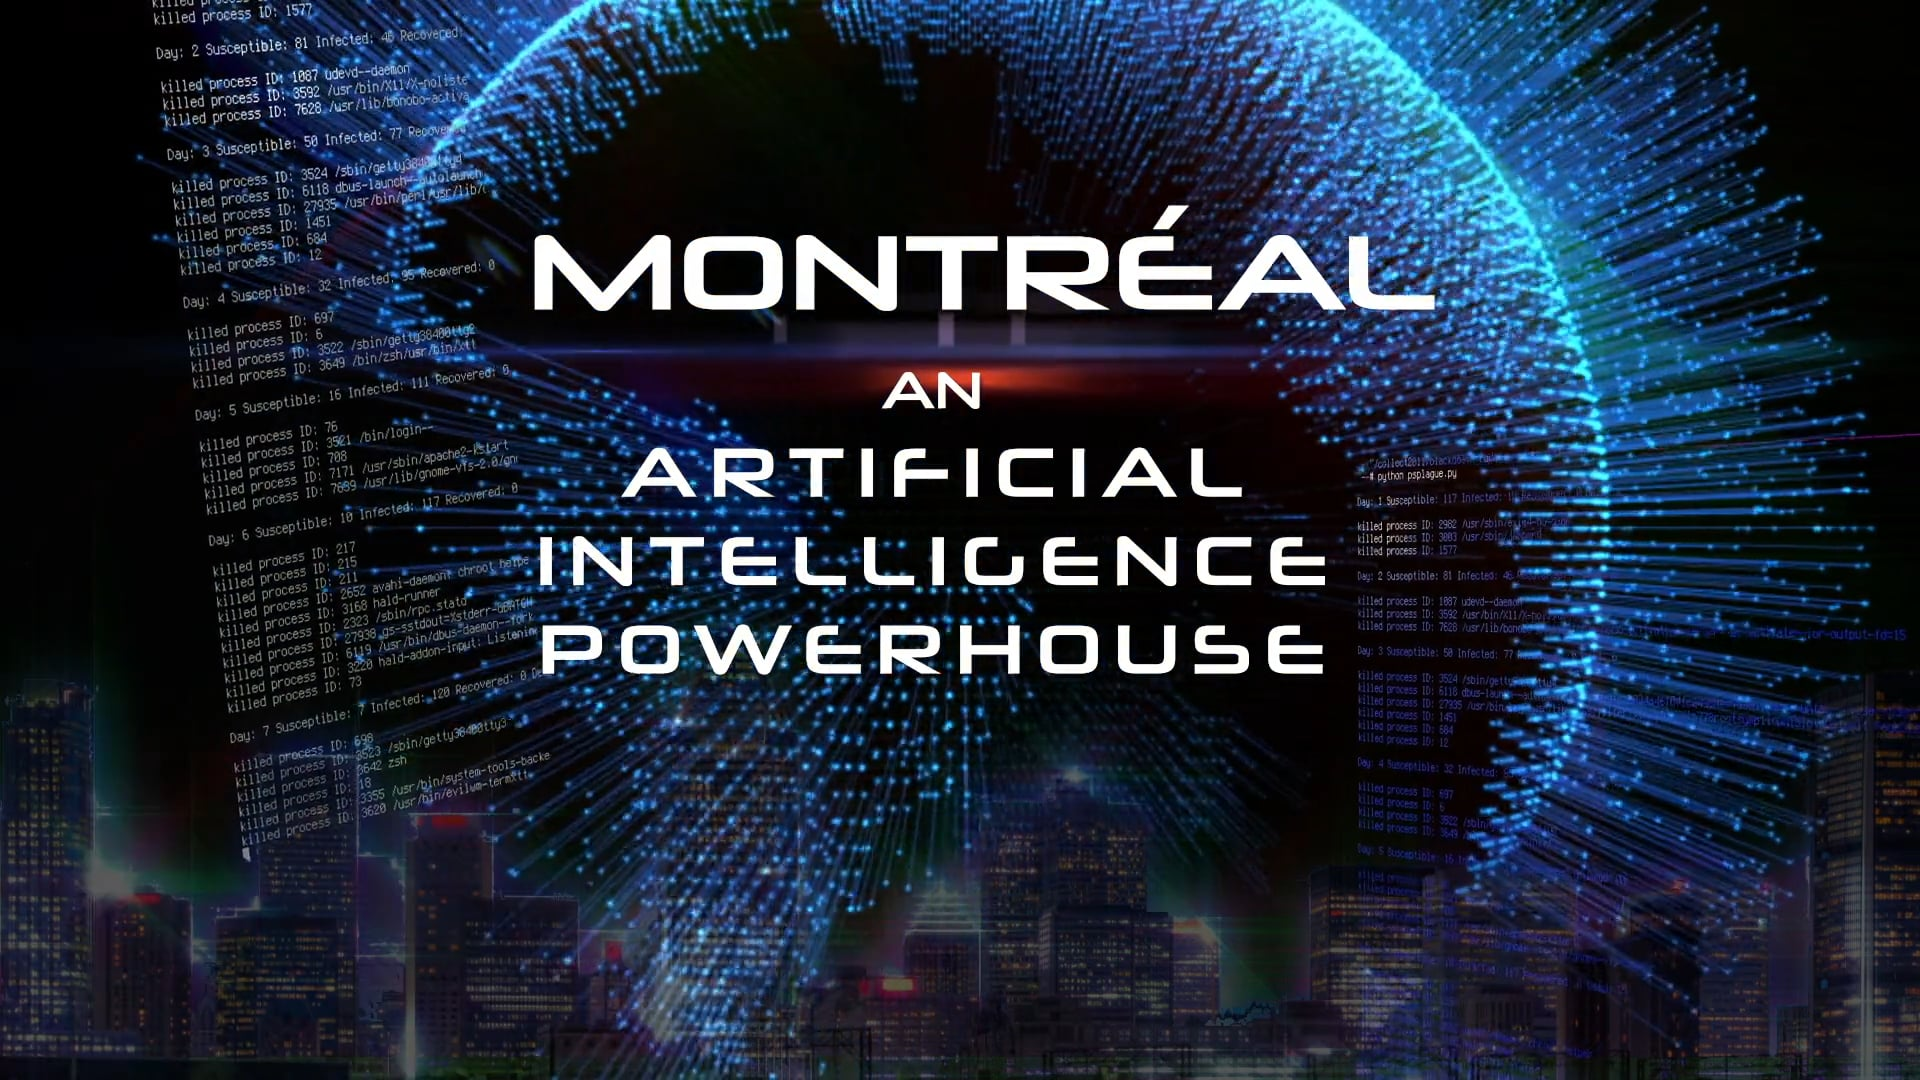 MONTREAL AI POWERHOUSE